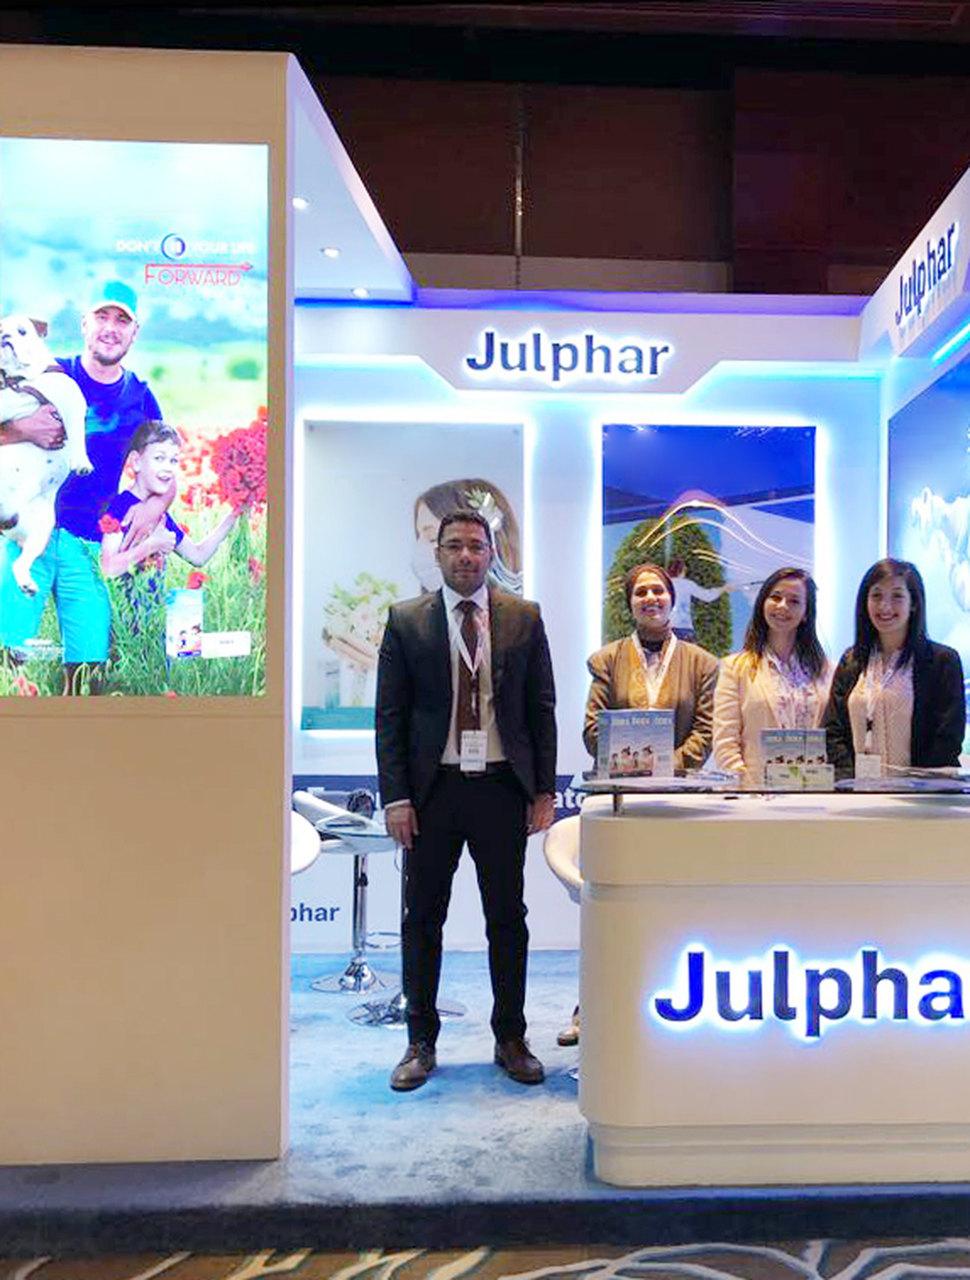 Julphar participates in the 8th edition of EROC